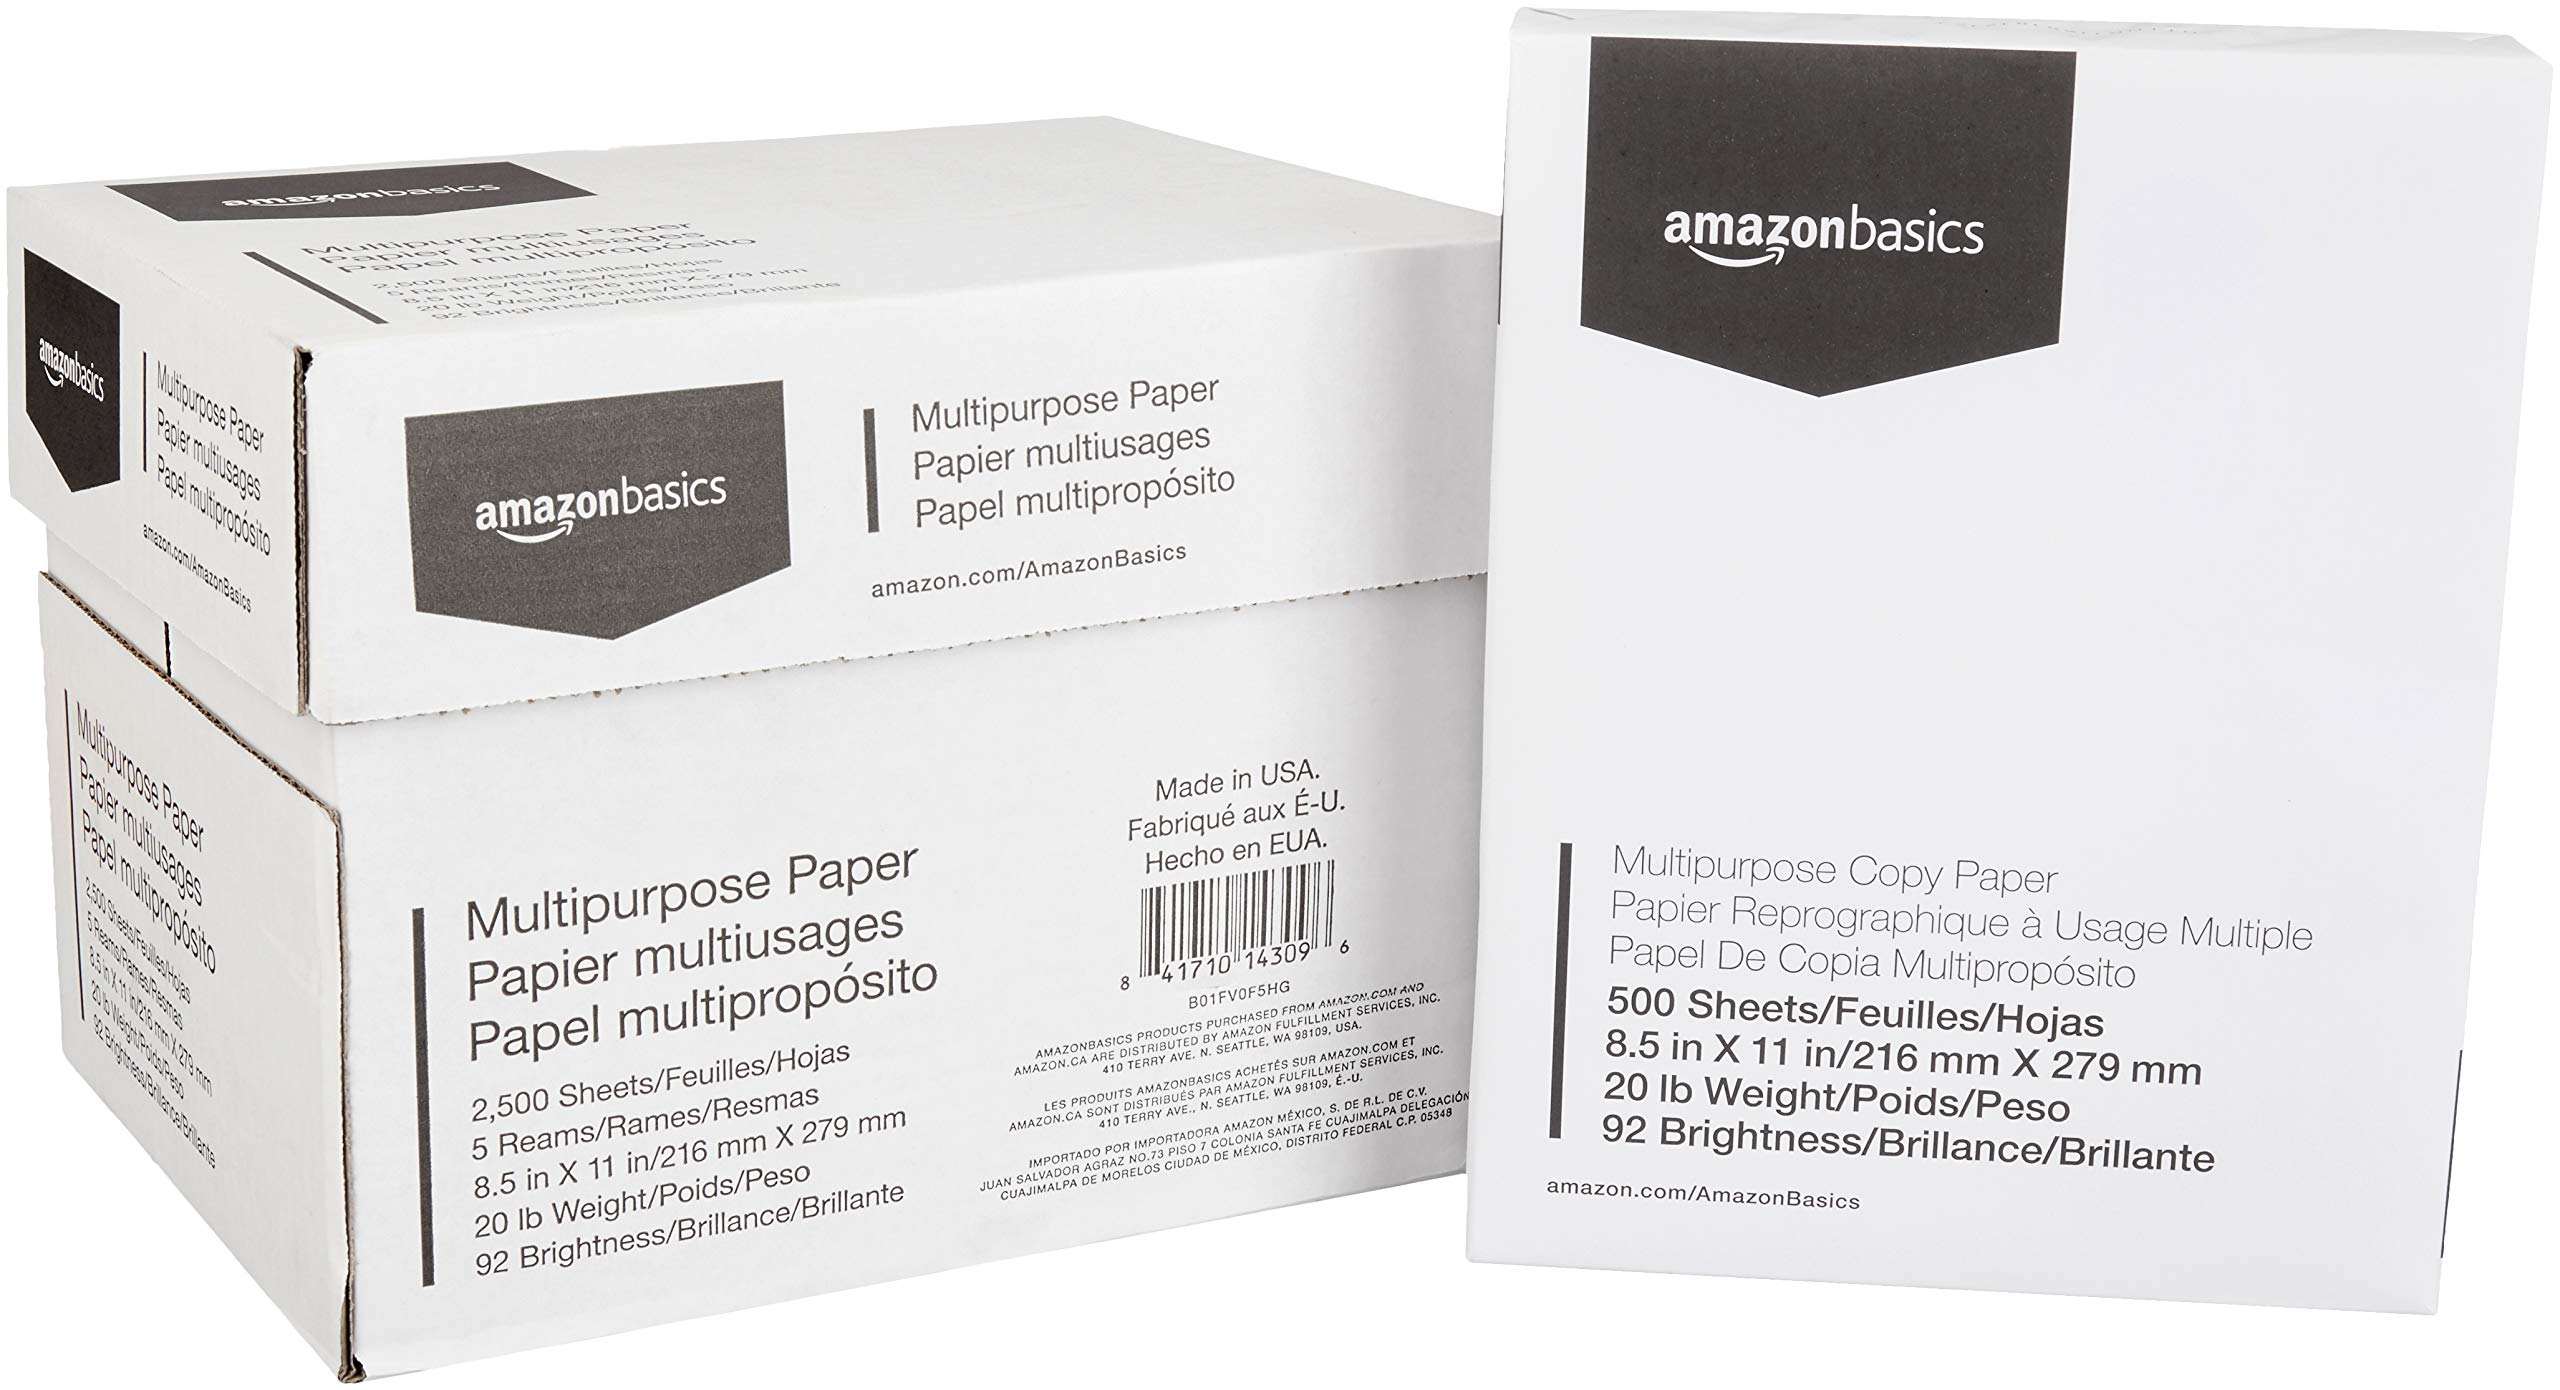 AmazonBasics Multipurpose Copy Printer Paper - White, 8.5 x 11 Inches, 5 Ream Case (2,500 Sheets) by AmazonBasics